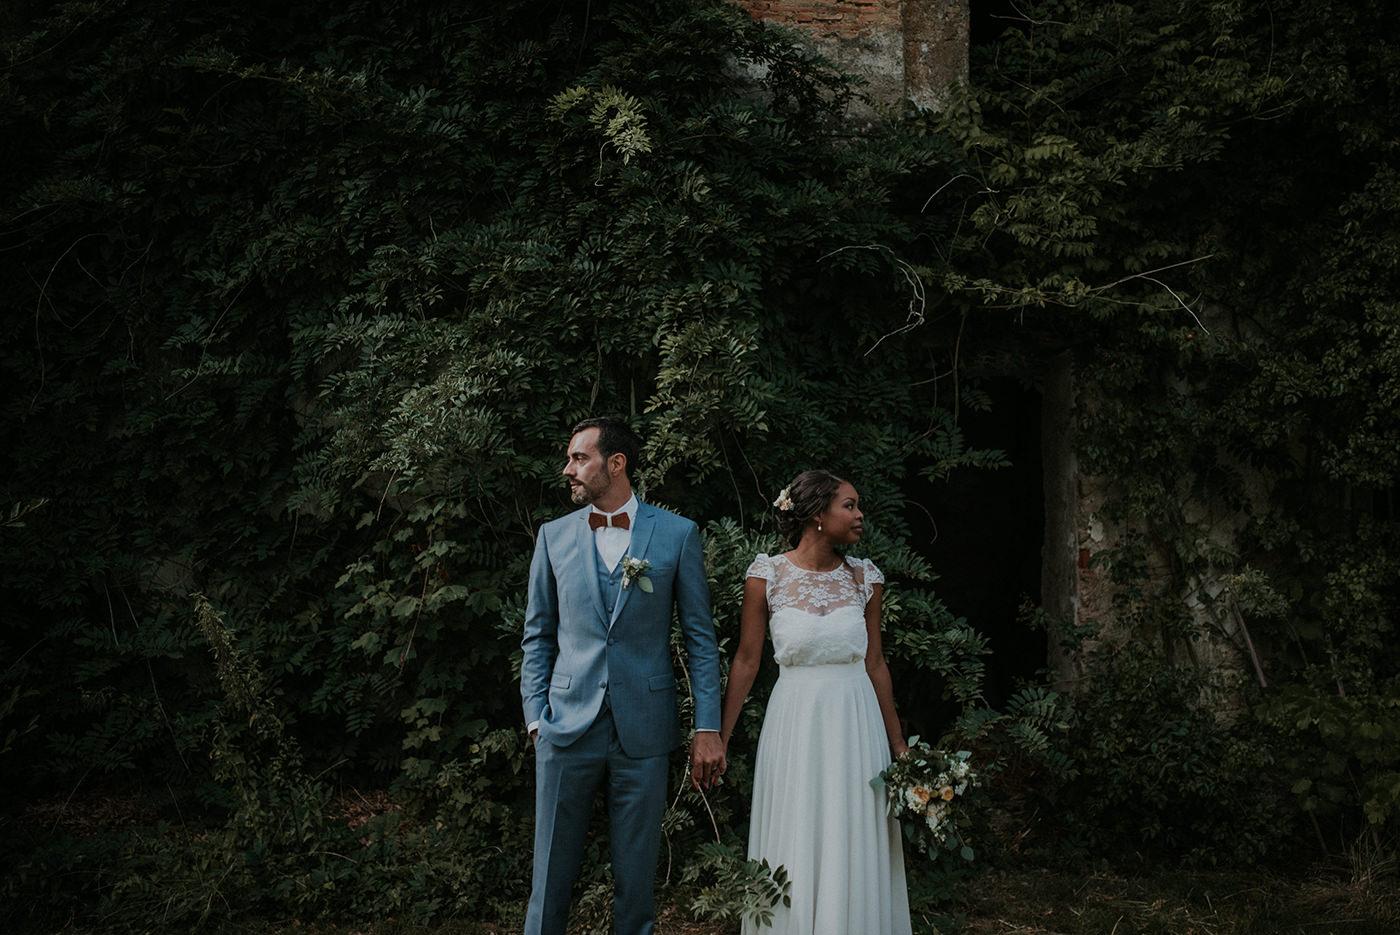 mariage champêtre végétal nantes